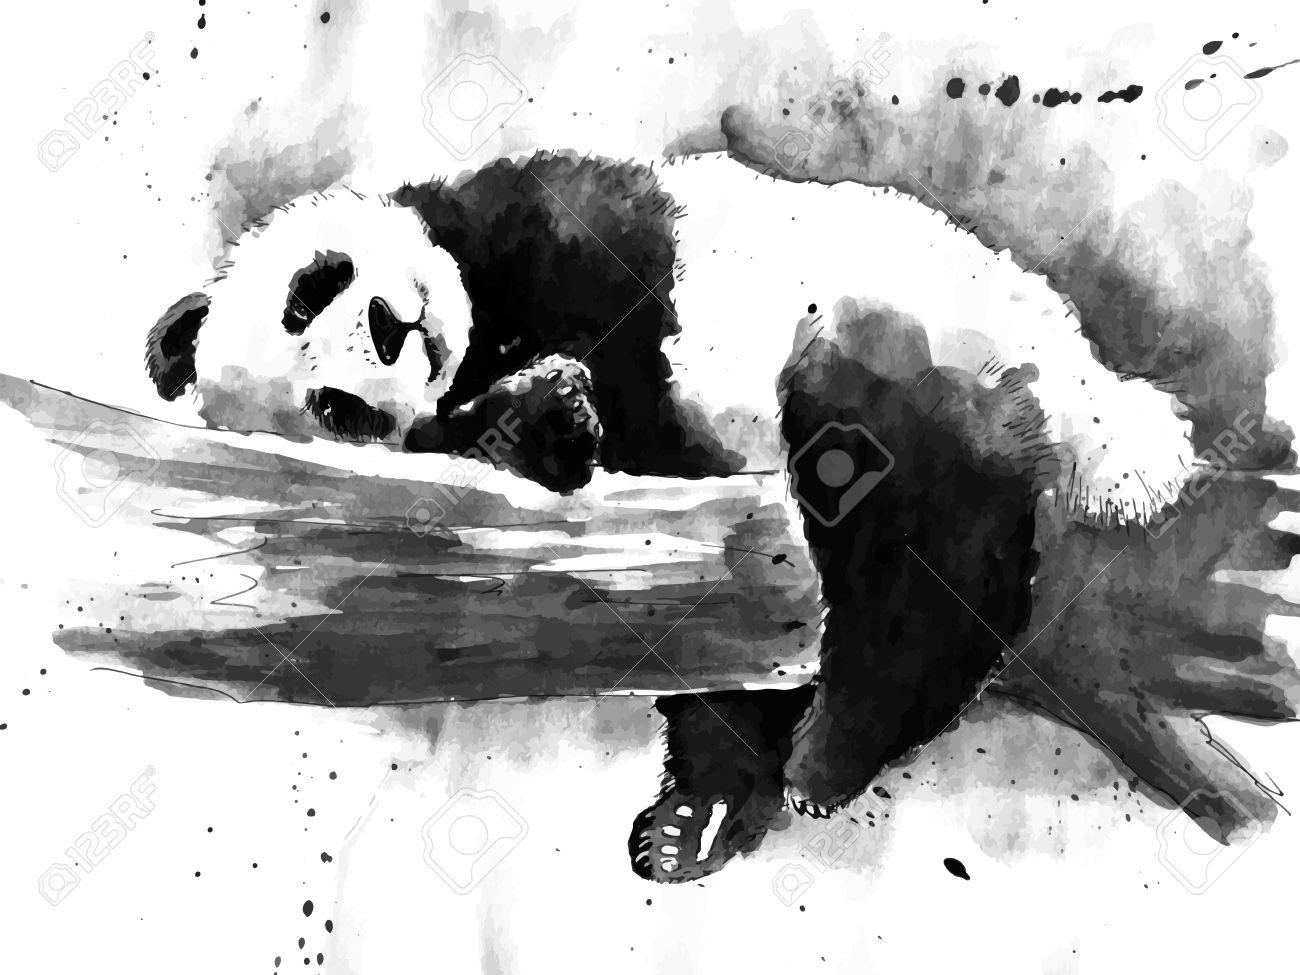 Watercolor black and white panda drawing - 57468448